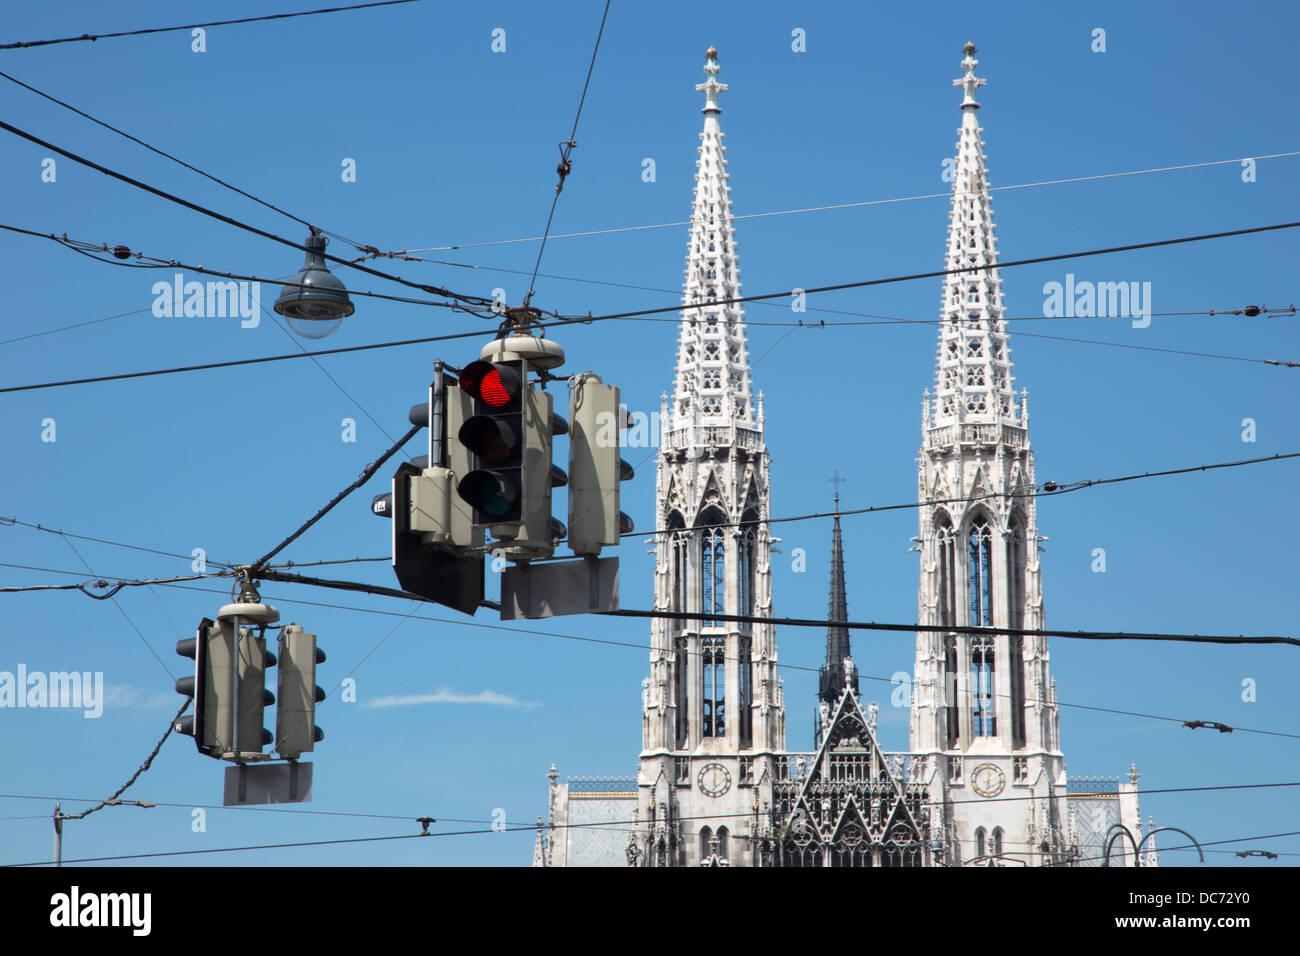 Vienna - towers of Votivkirche neo - gothic church and semaphores - Stock Image